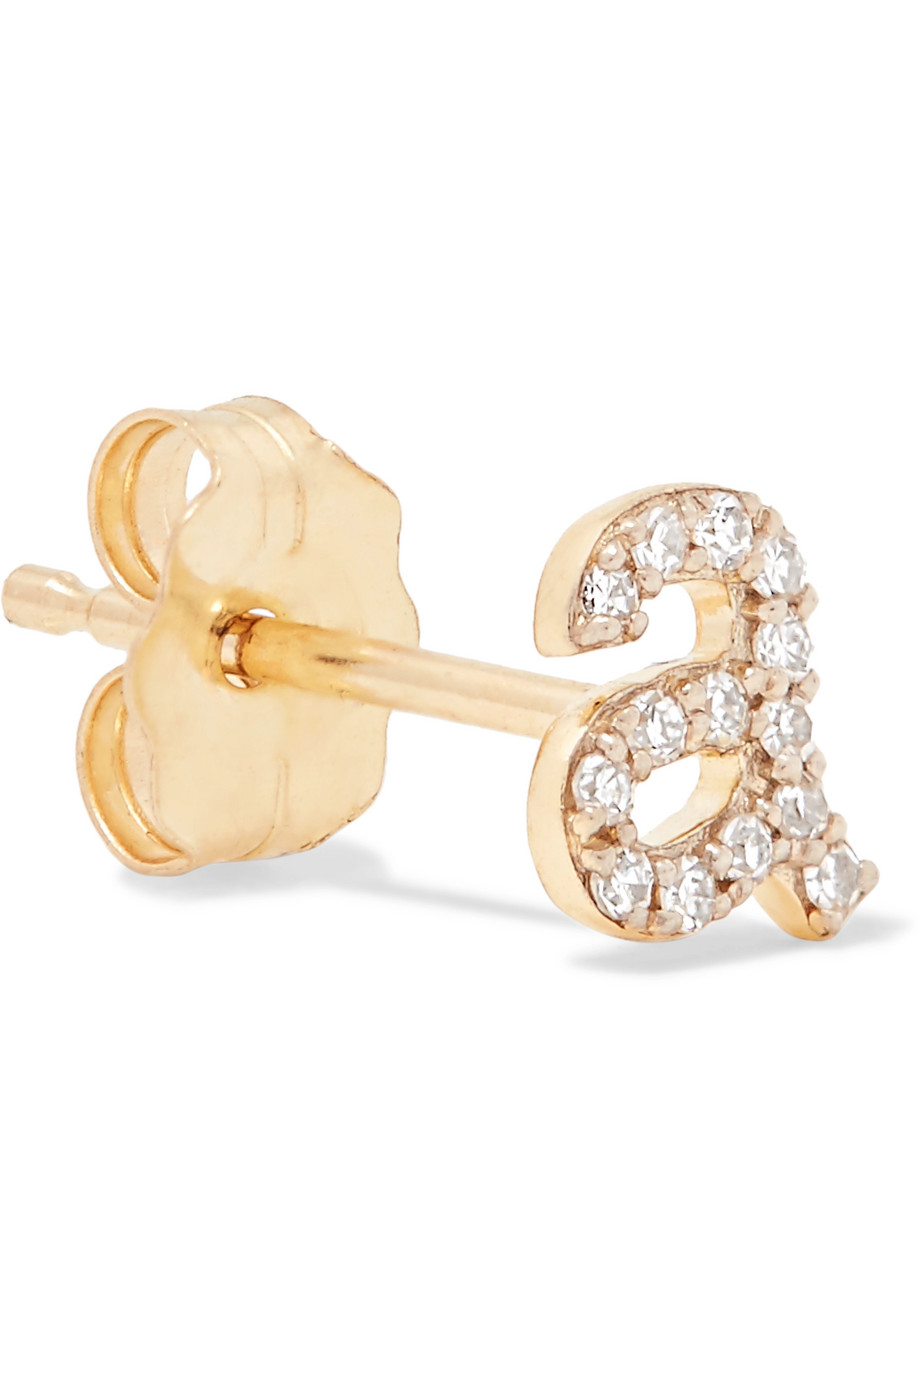 STONE AND STRAND Alphabet 14-karat gold diamond earring